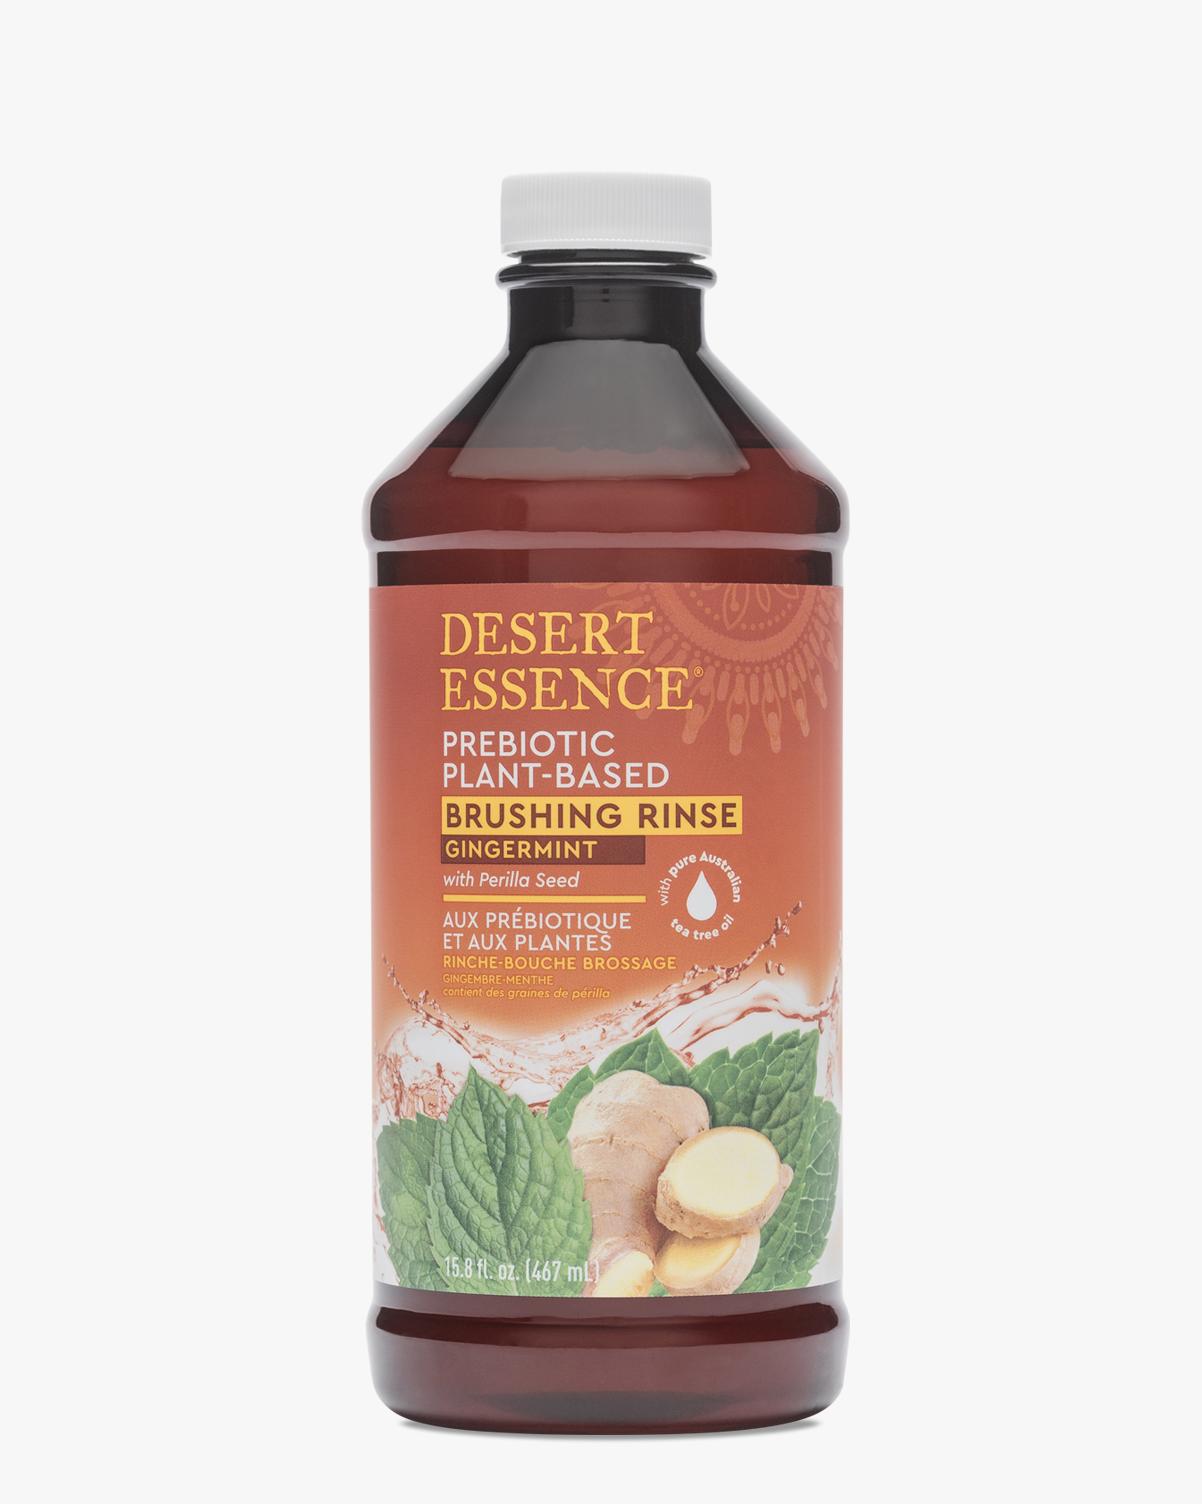 Desert Essence coupon: Desert Essence Prebiotic Plant Based Brushing Rinse - Gingermint Mouthwash, 15.8 oz. | Vegan | Gluten-Free